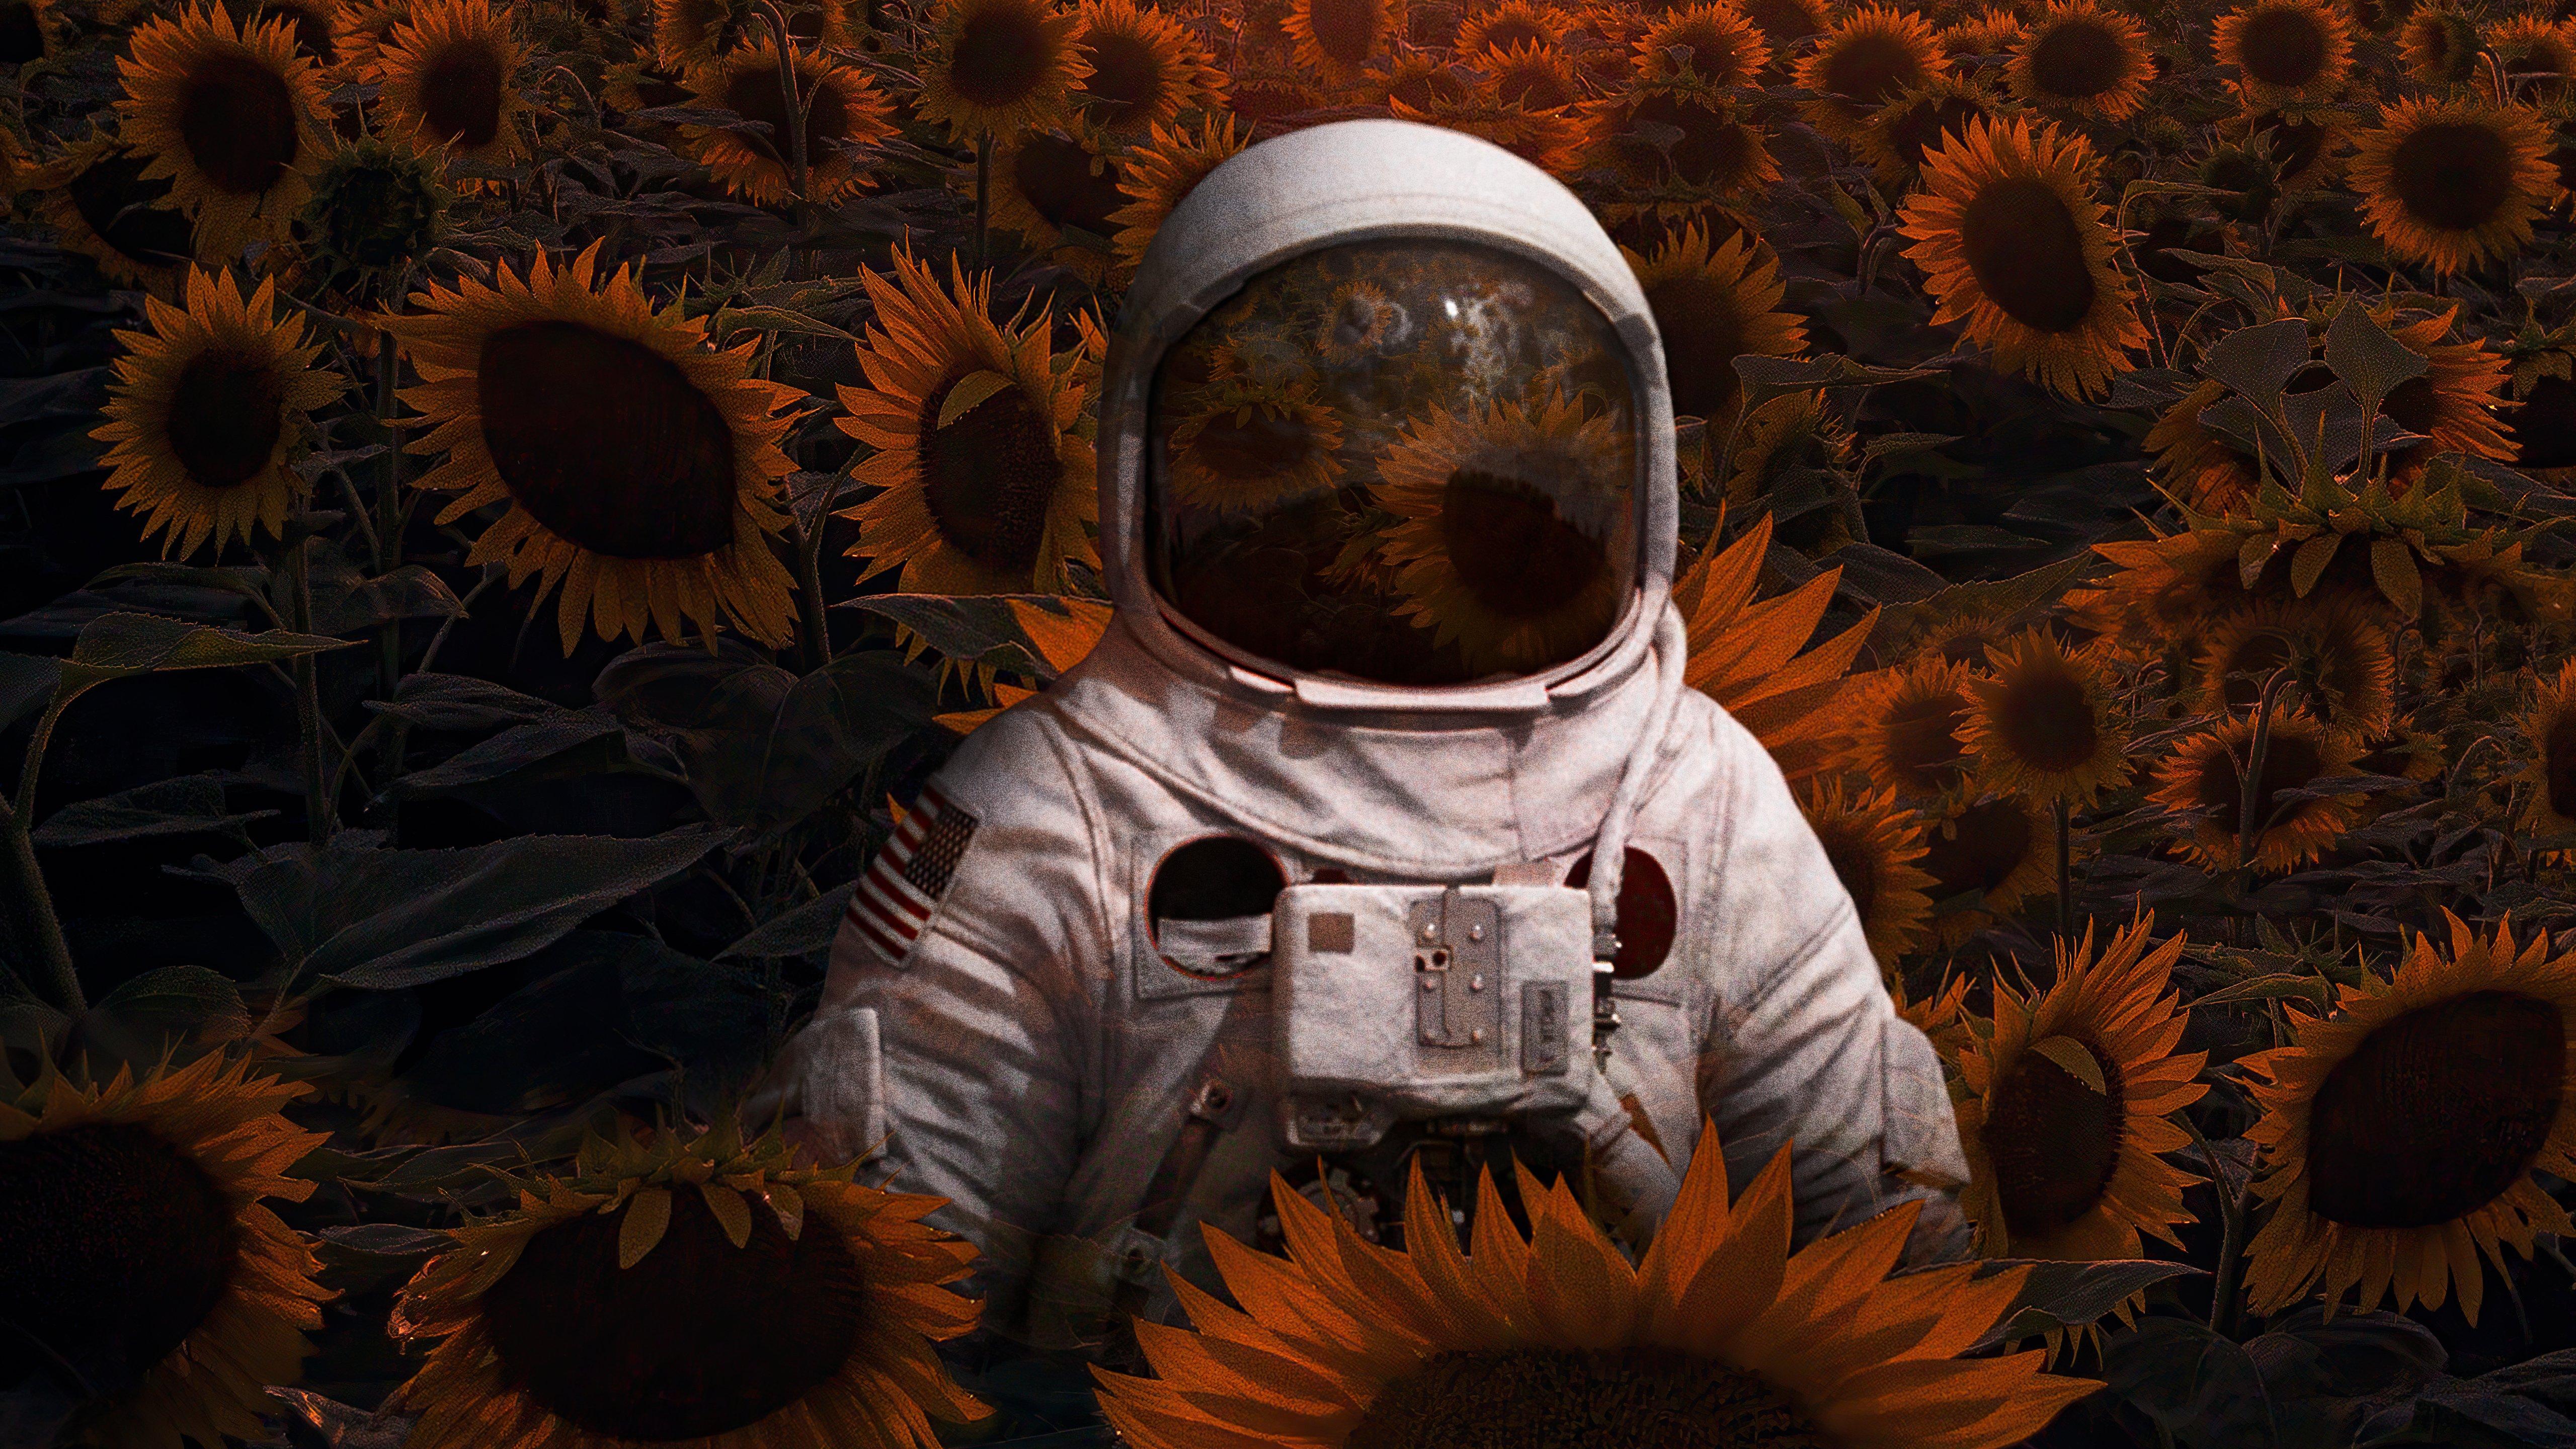 Wallpaper Astronaut in sunflower field